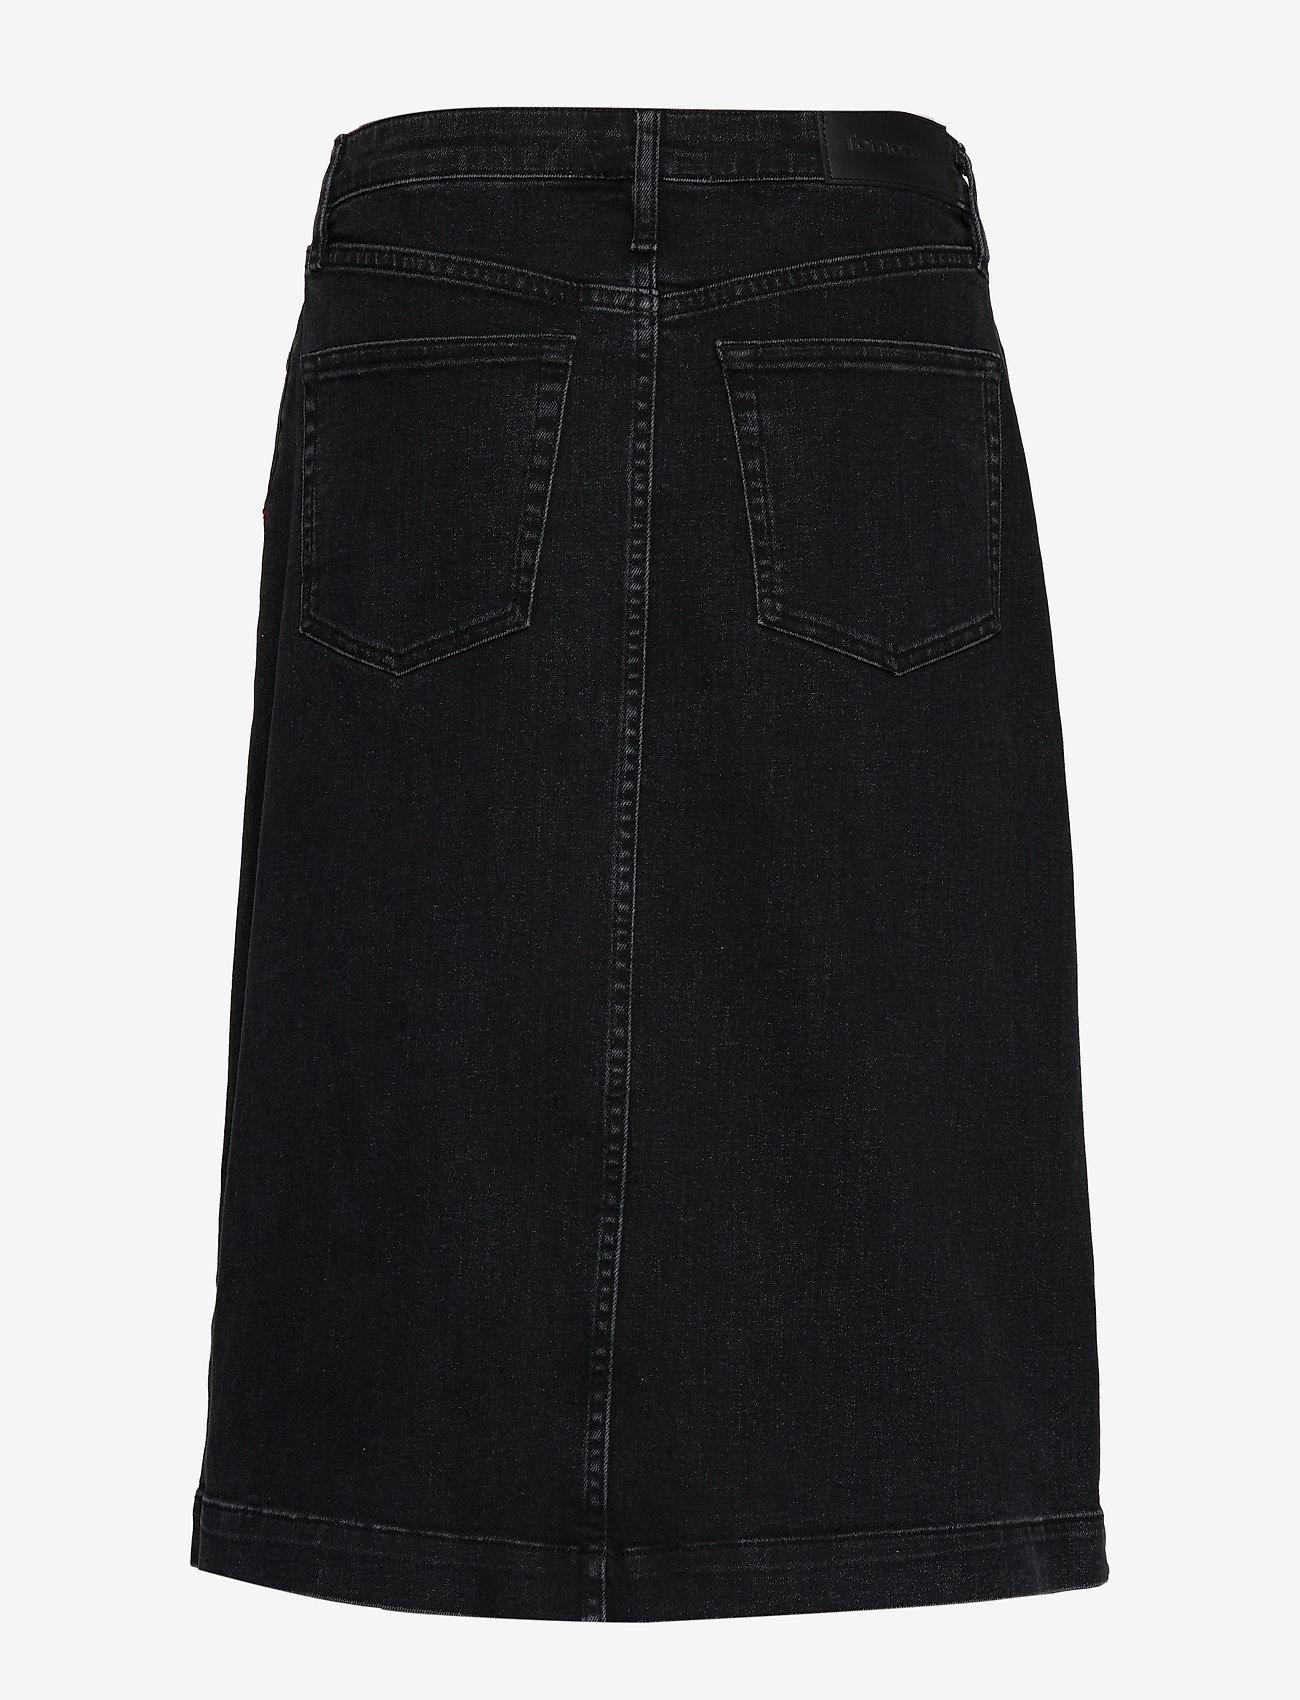 Tomorrow - Hepburn denim skirt original black - jeansröcke - black - 1